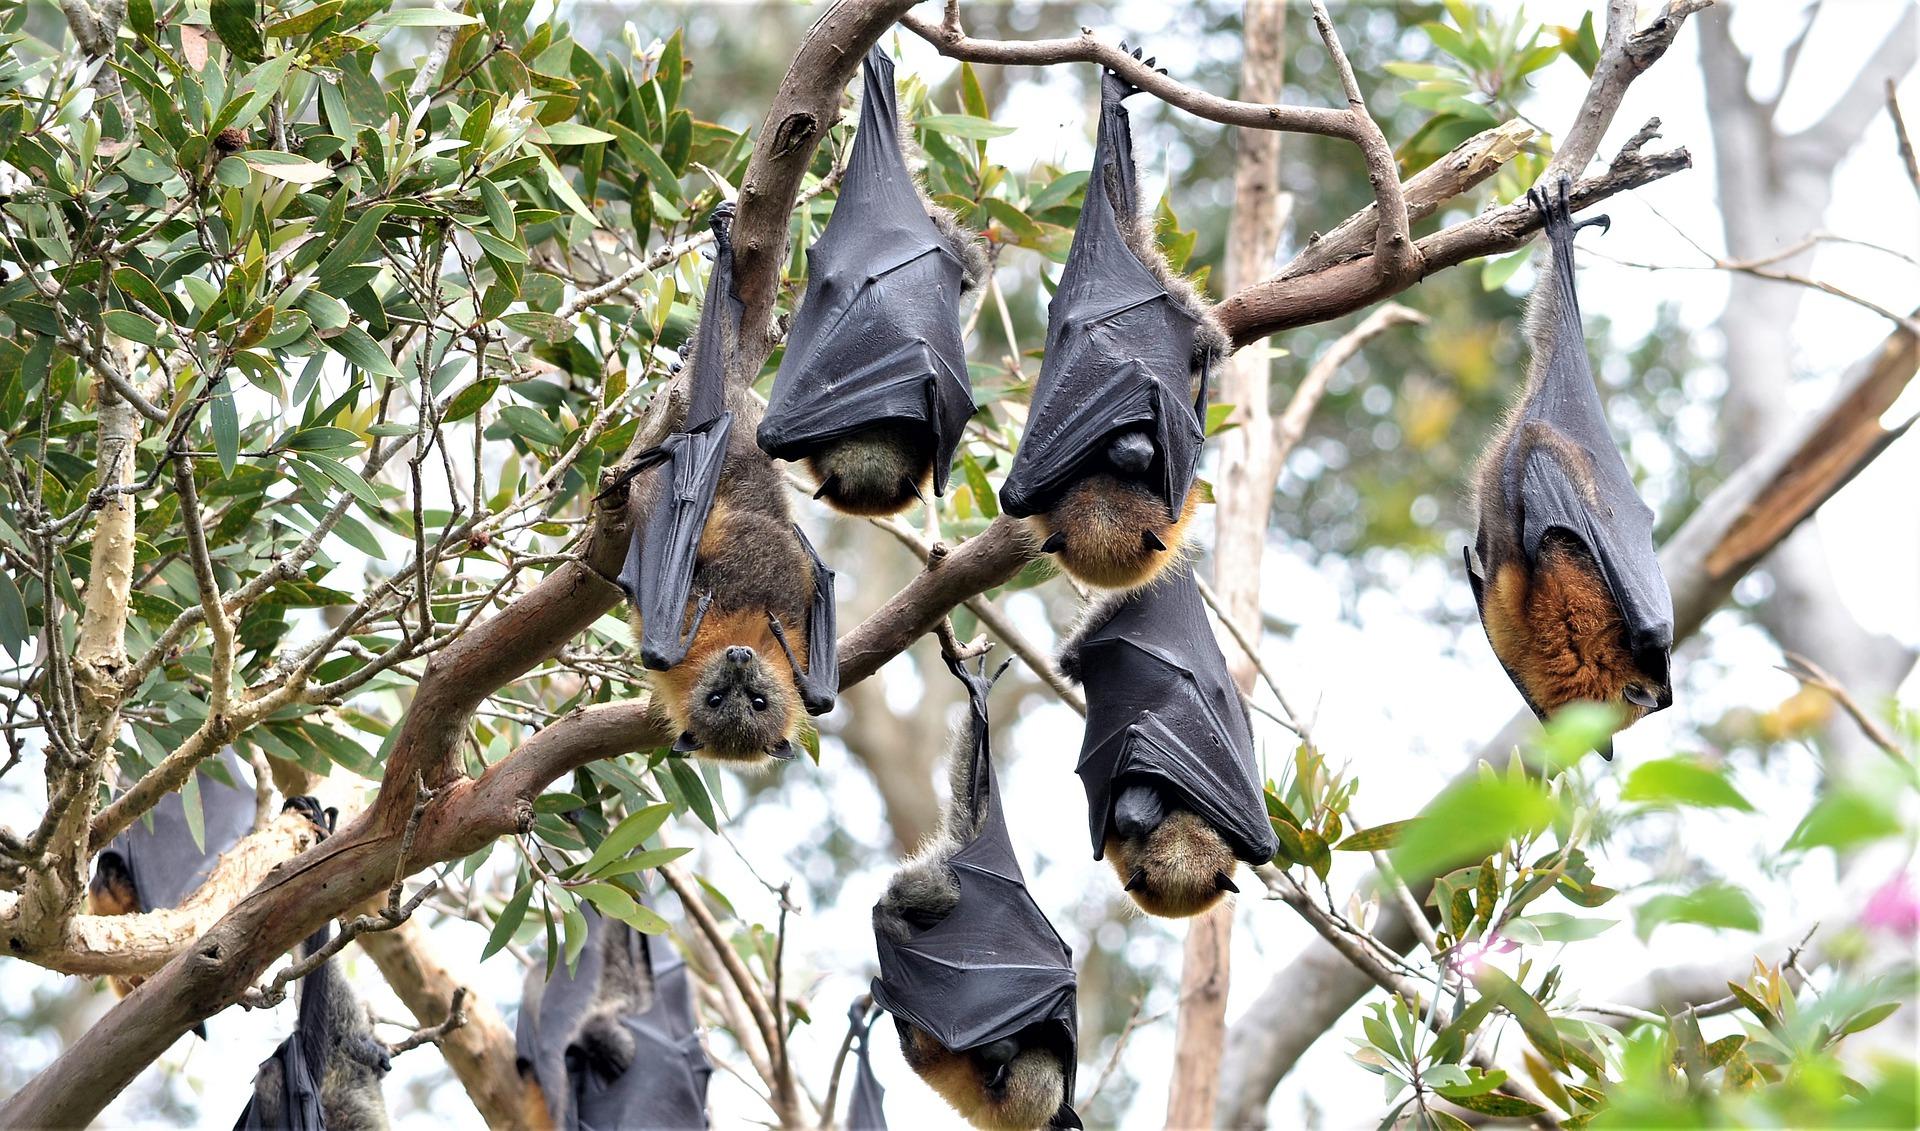 Fruit Bat Colony, Fruit Bat Roost, Megabat Colony